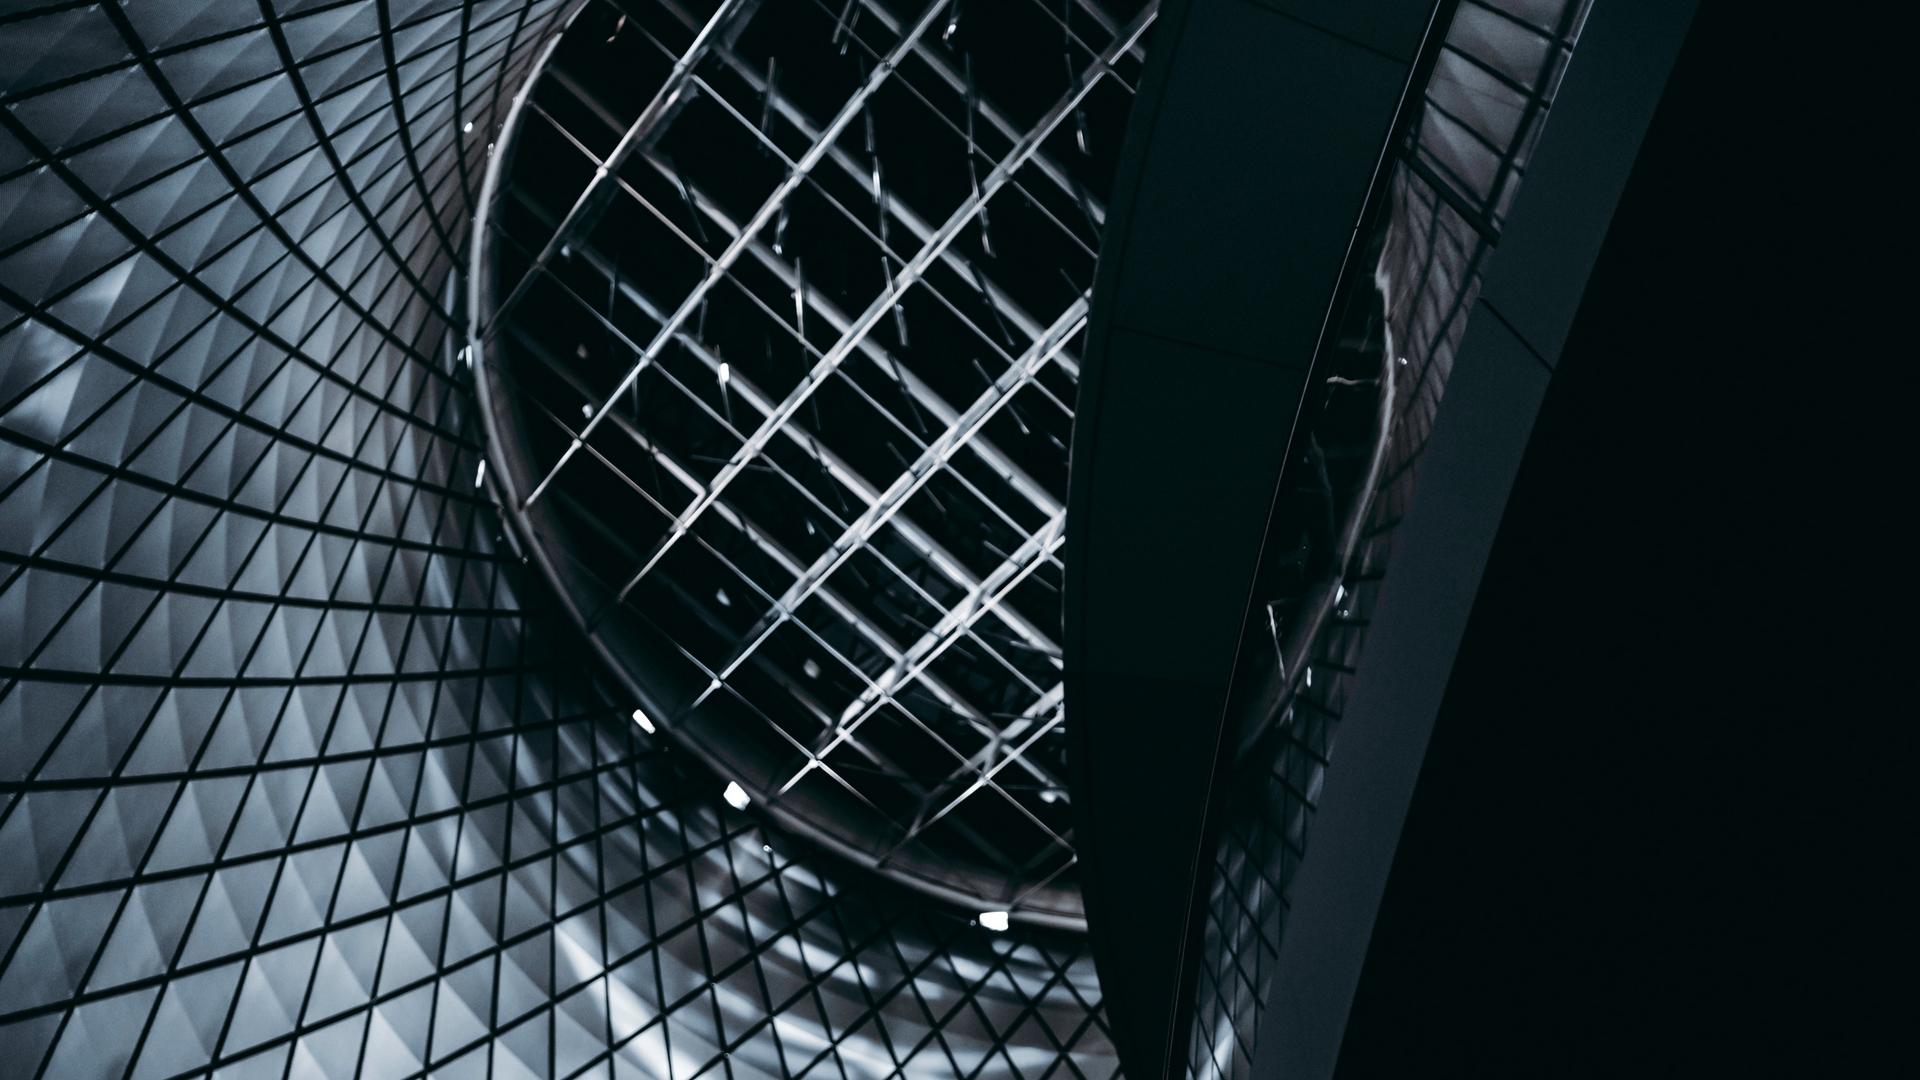 Wallpaper Architecture, Building, Minimalism, Dark, - Desktop Wallpaper 4k Architecture - HD Wallpaper